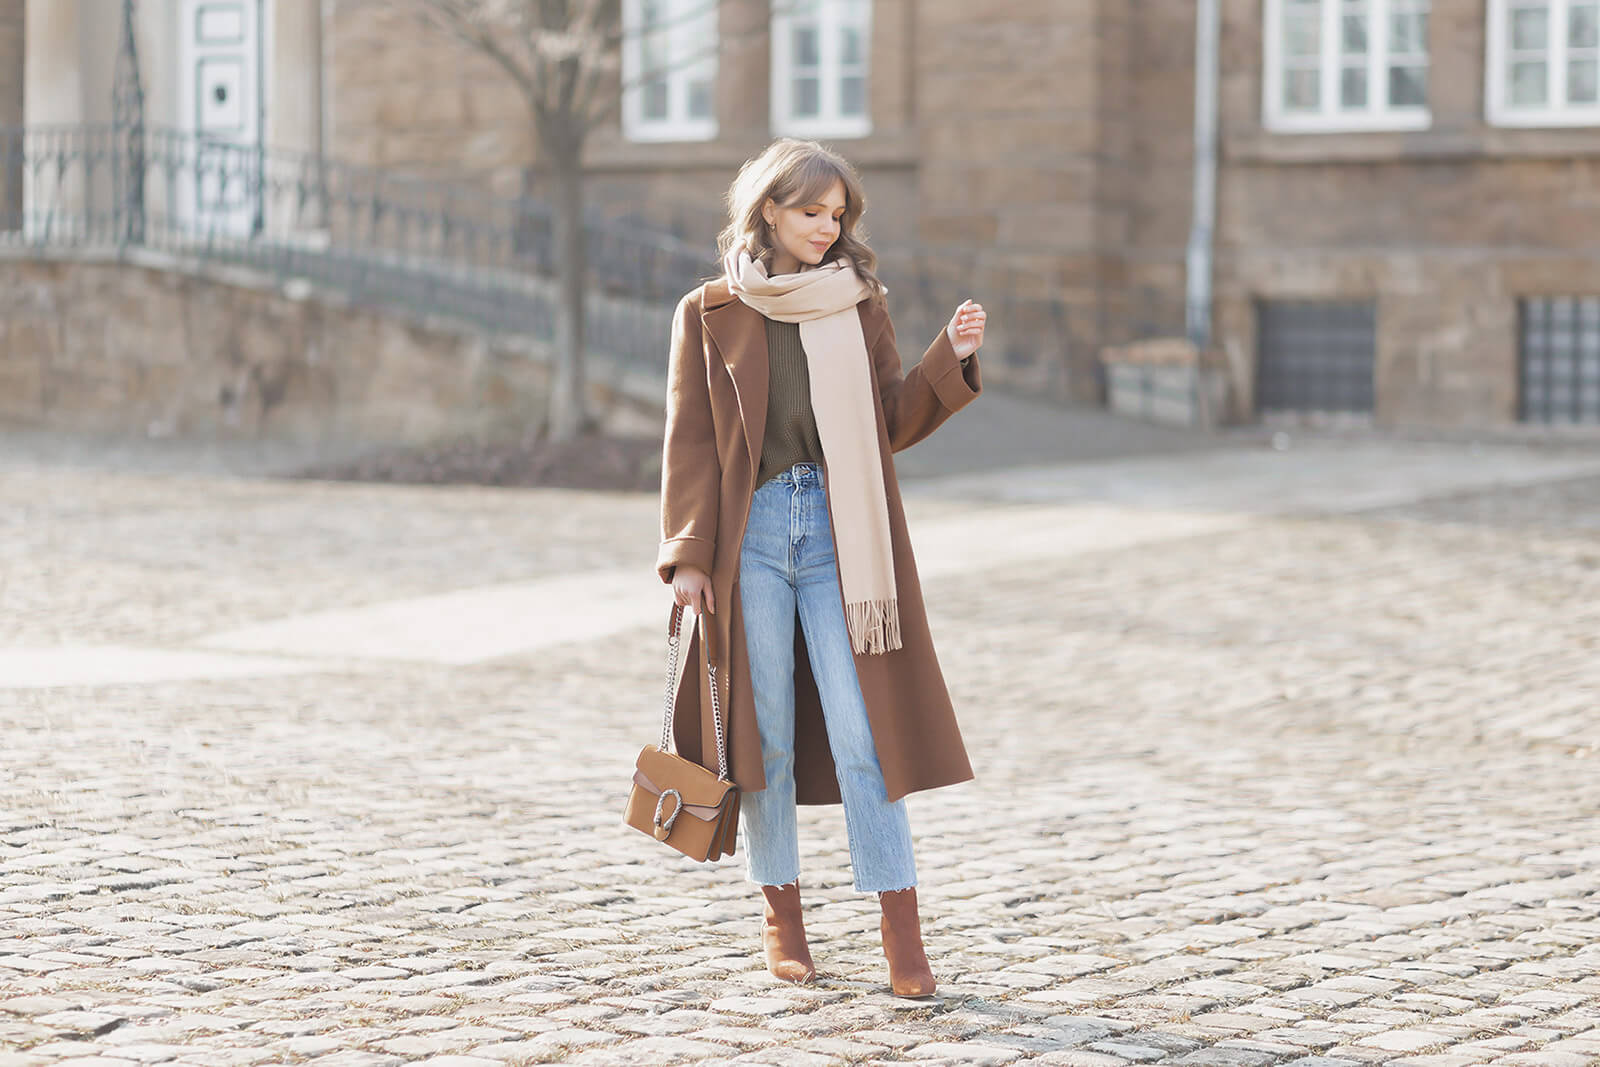 XXL Mäntel kombinieren, Oversized Coats Trend, Shoelove by Deichmann